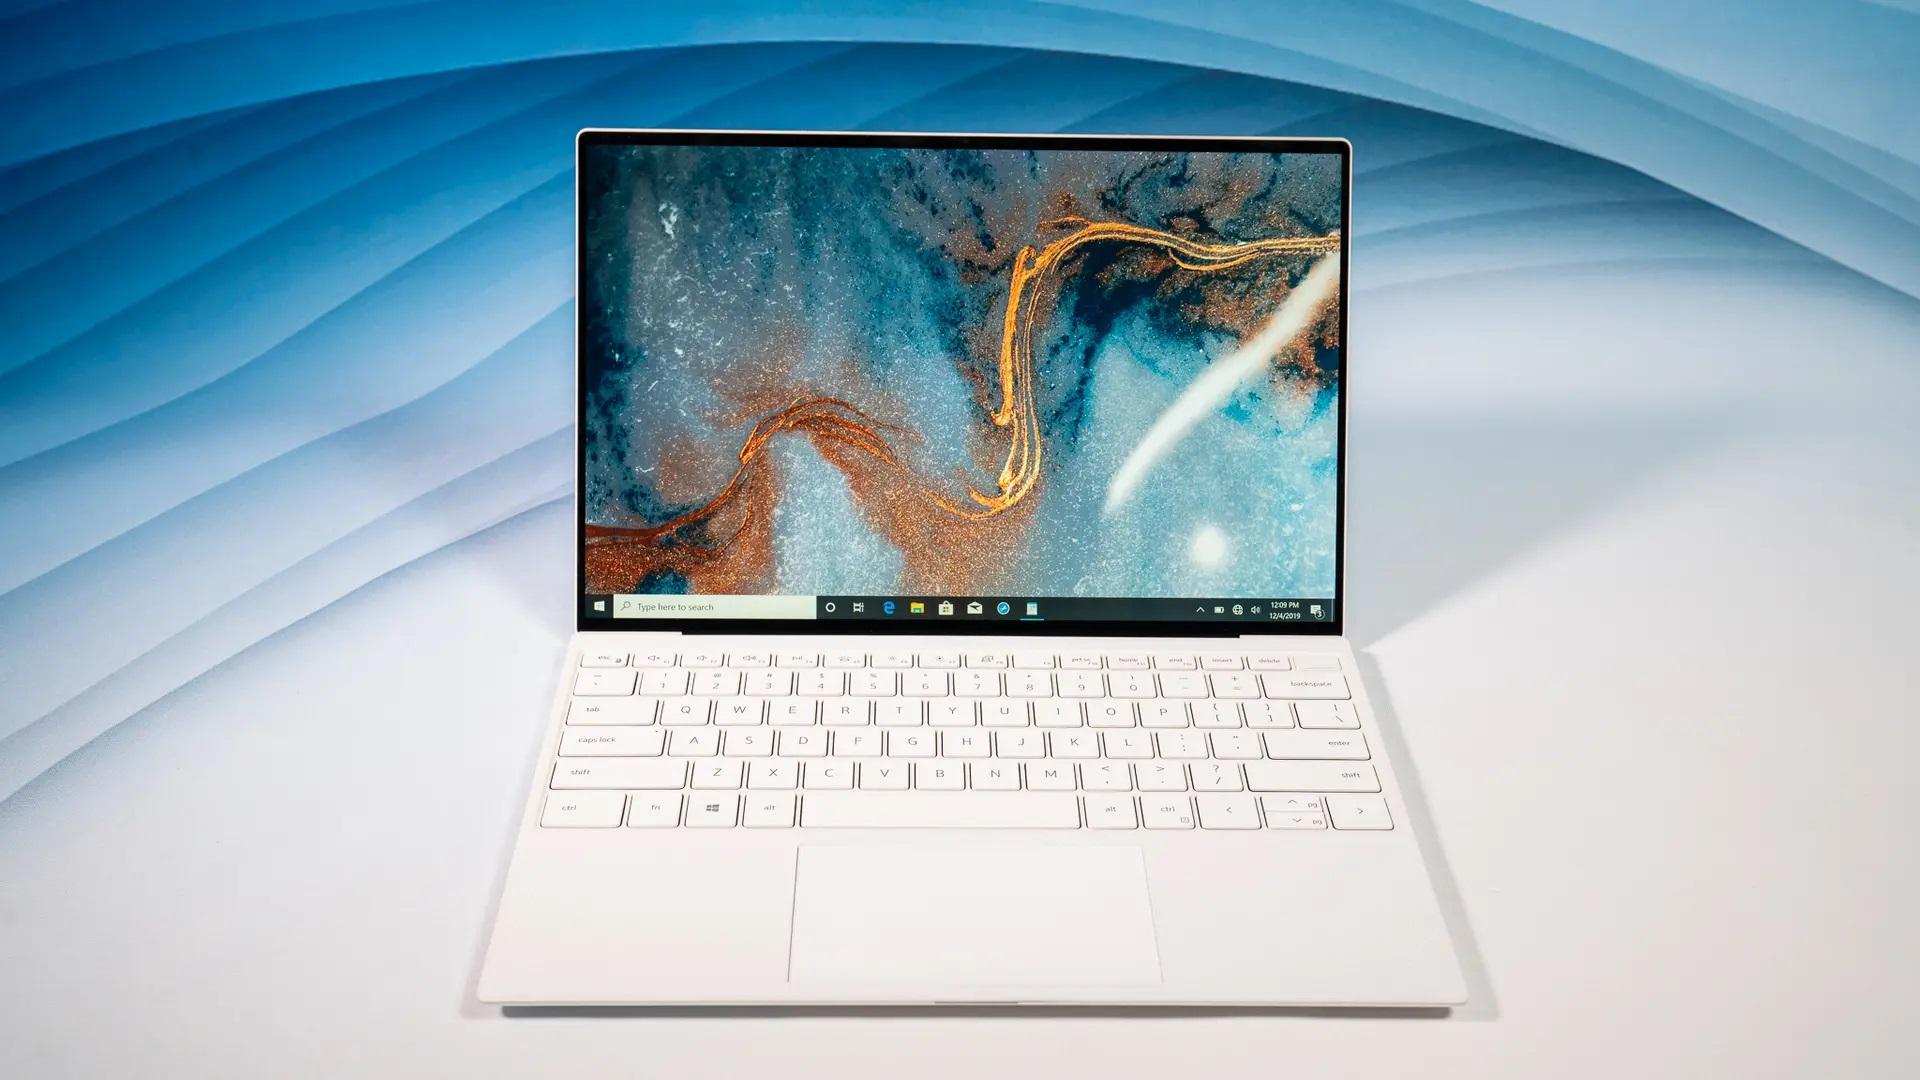 Dell XPS 13 (9300): a valid alternative